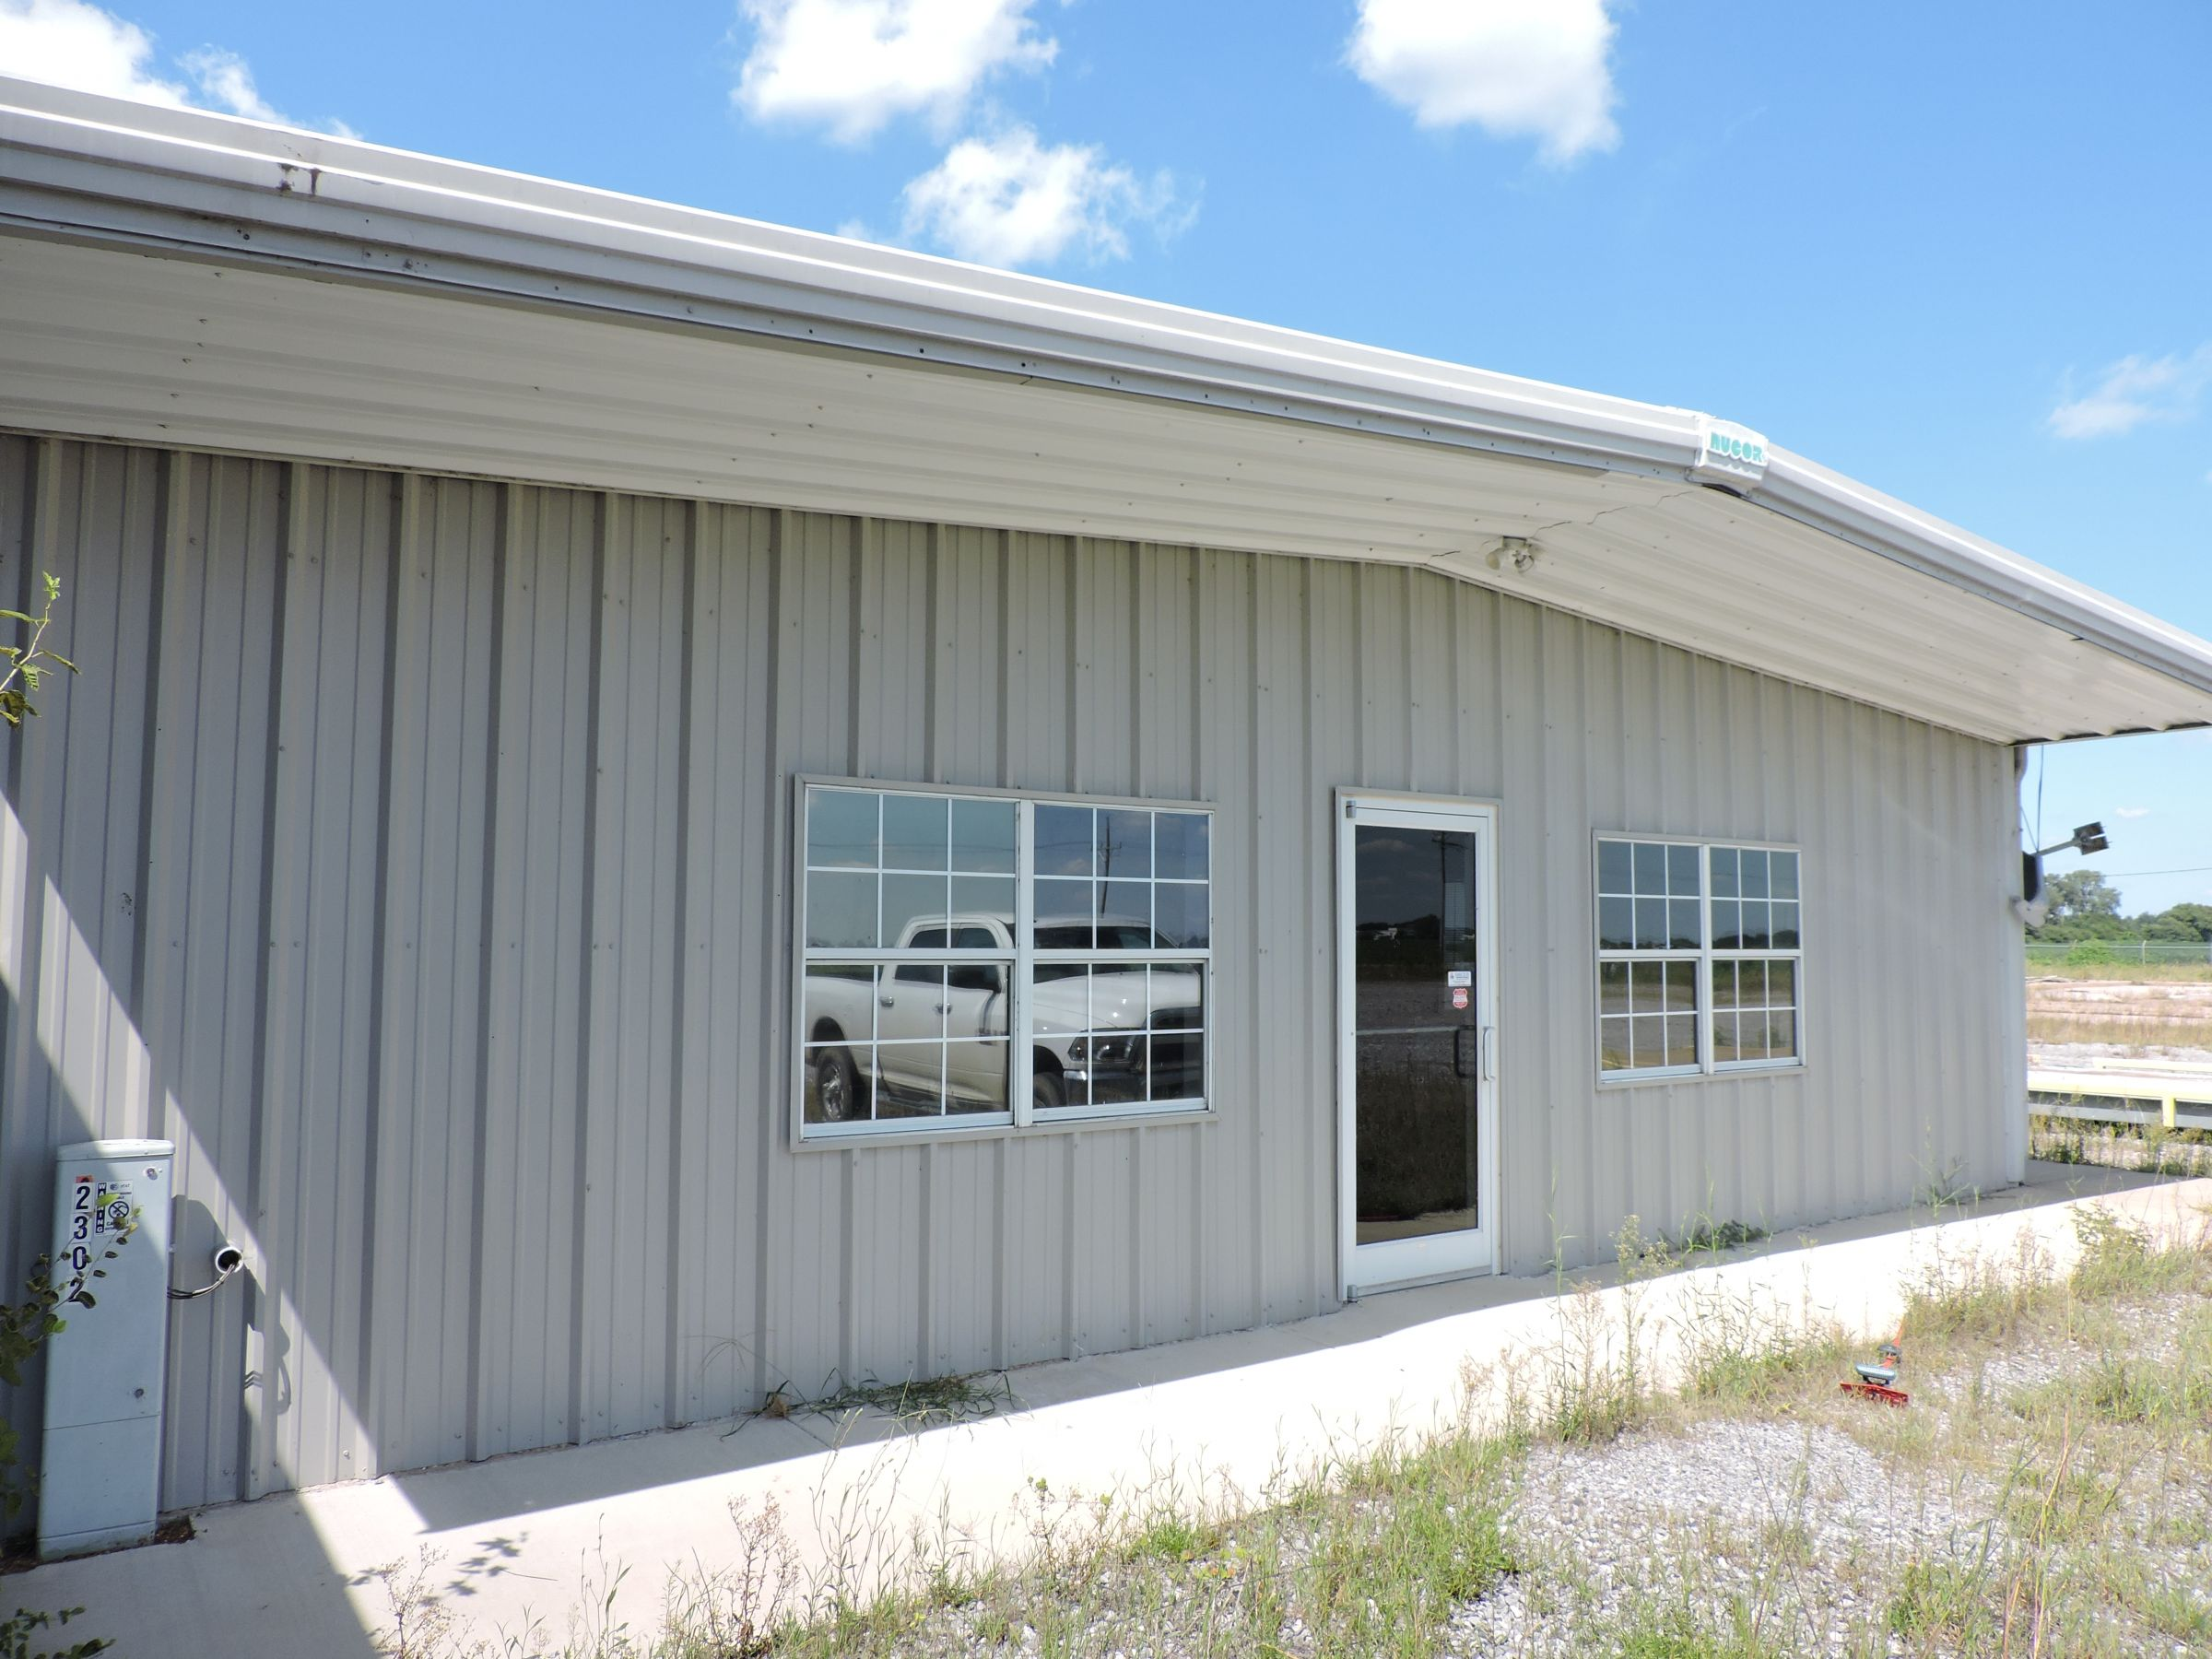 commercial-mississippi-county-arkansas-11-acres-listing-number-15009-0-2020-06-08-194605.JPG